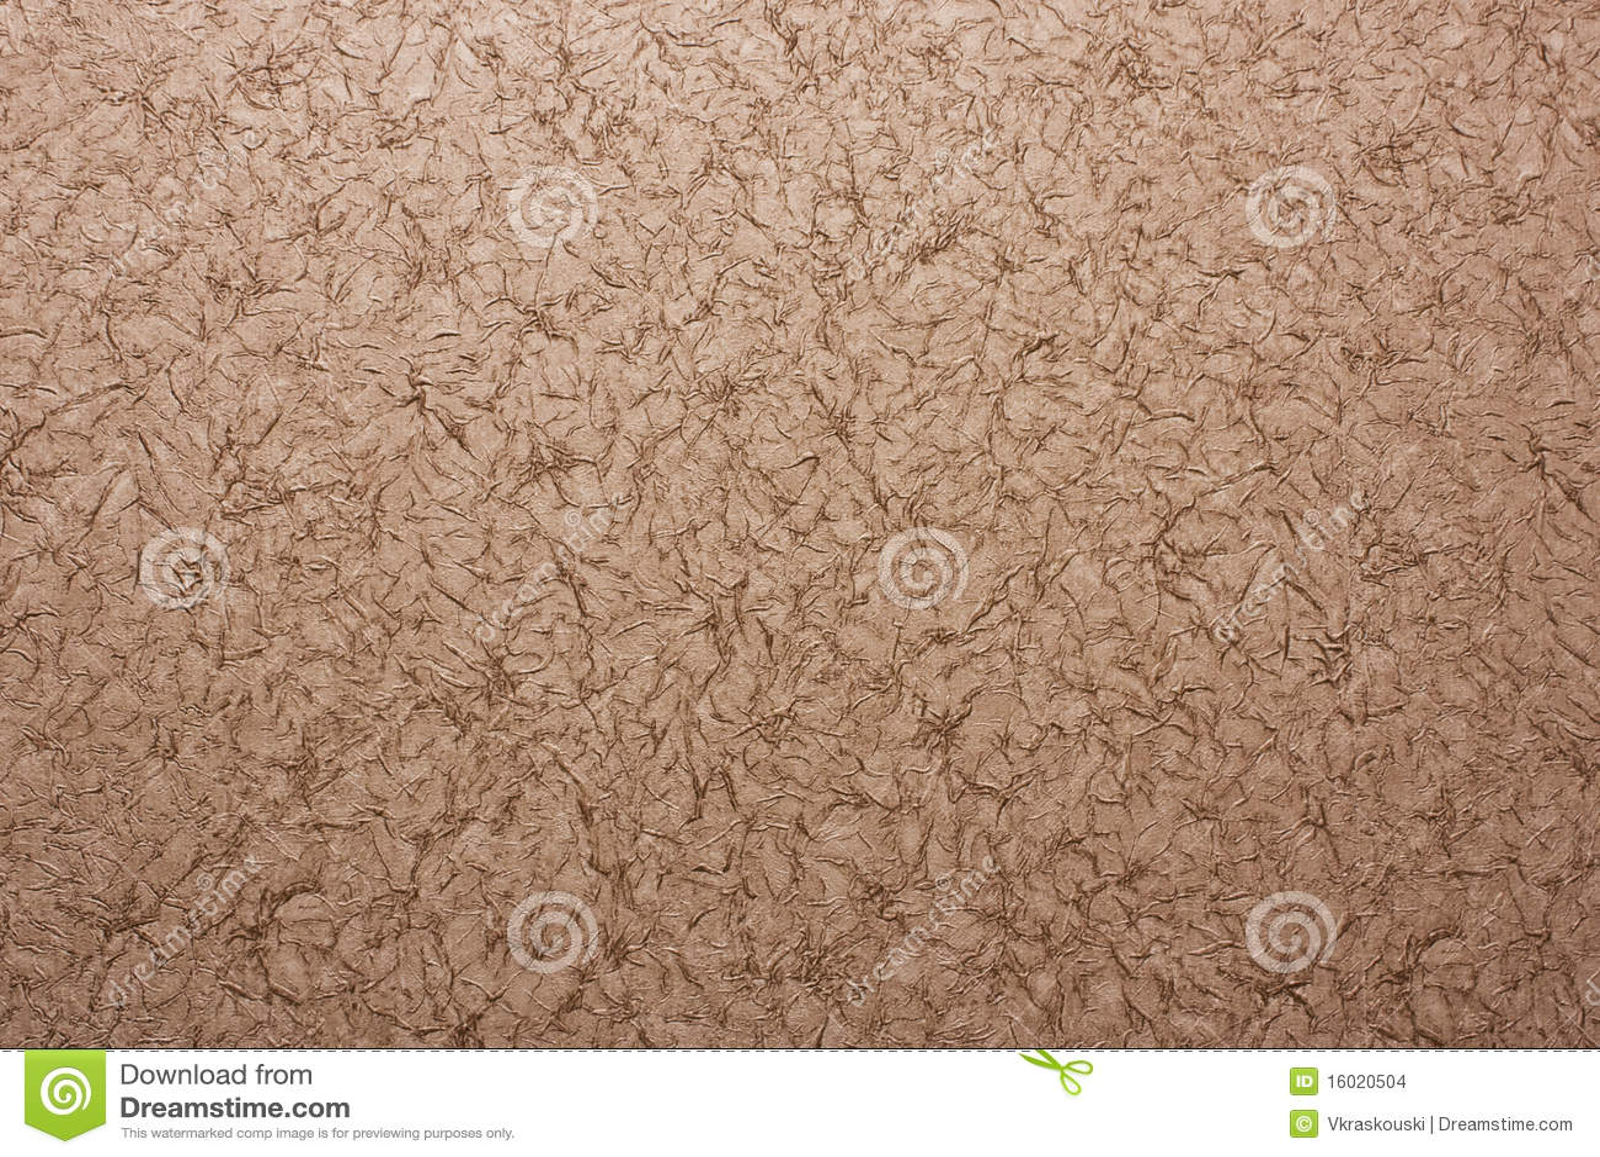 braune tapete der weinlese stockbilder bild 16020504. Black Bedroom Furniture Sets. Home Design Ideas